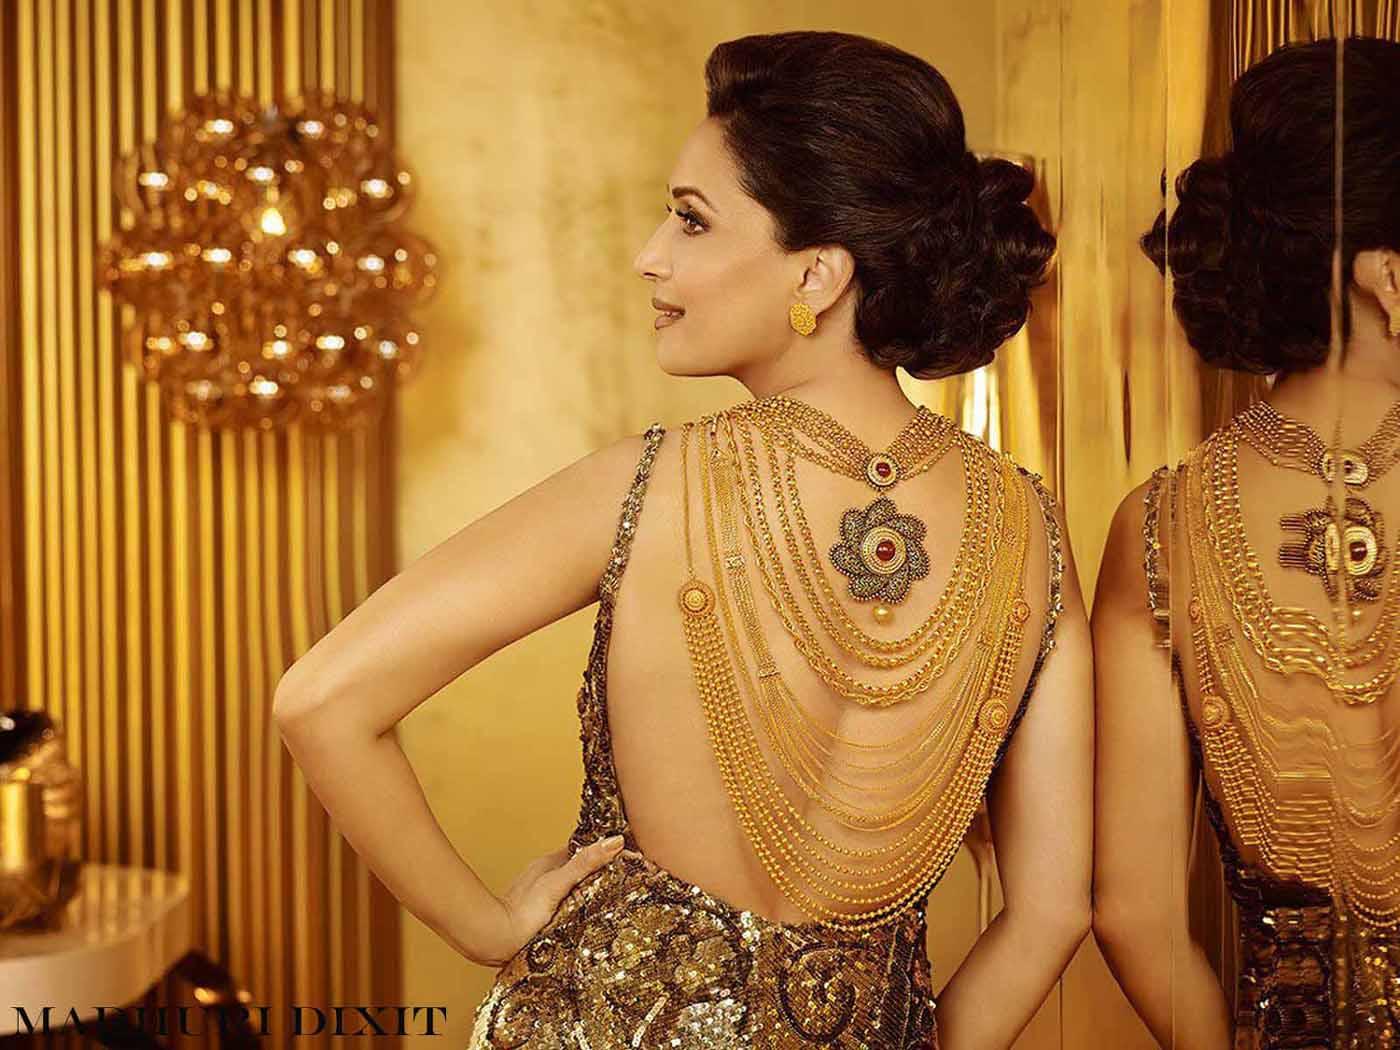 Madhuri Dixit Hot Photos Hot Images Hot Pics Hd Images 1400x1050